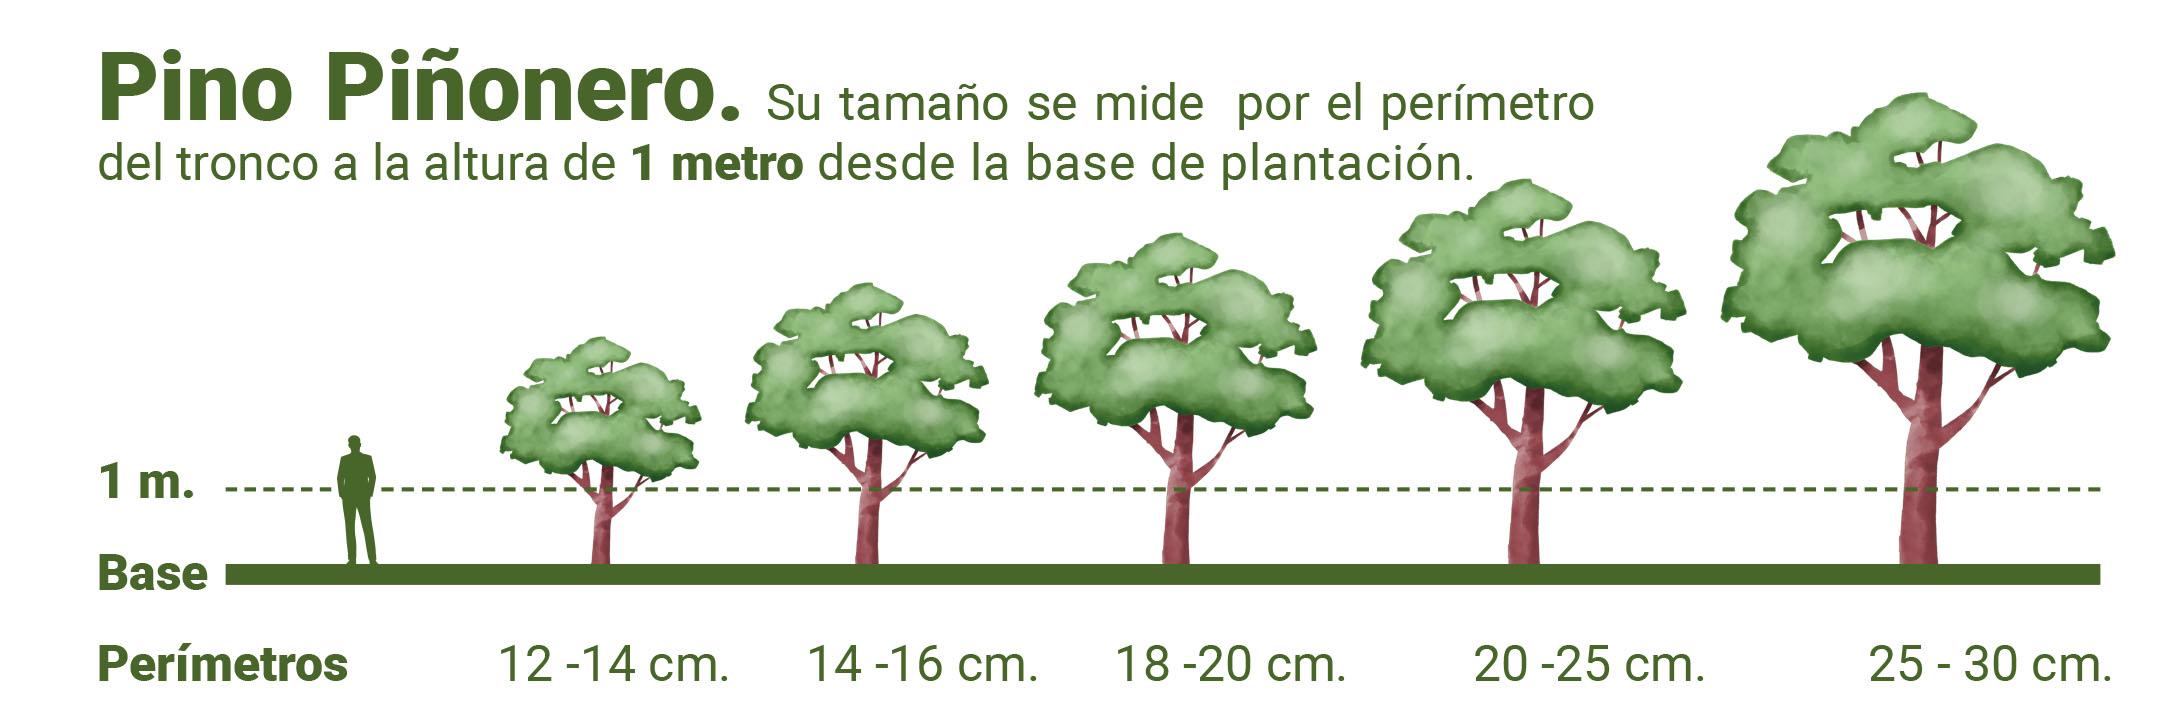 pino piñonero